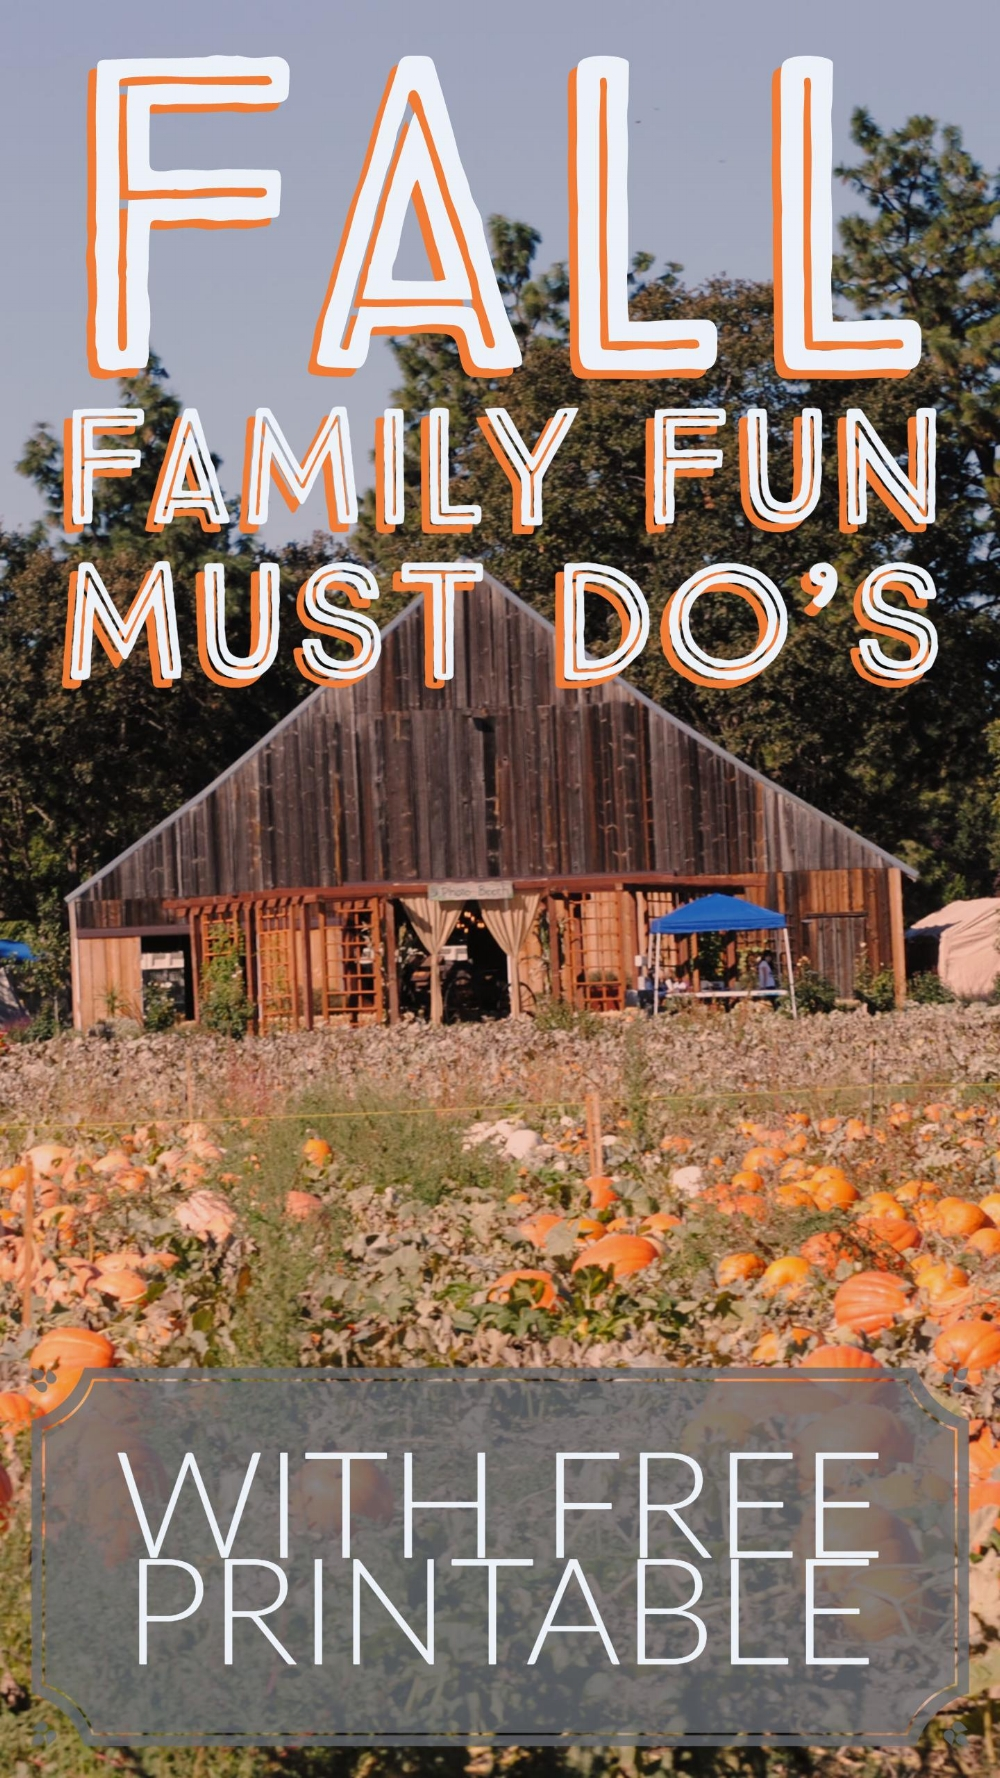 FALL FAMILY FUN MUST DO'S - A BUCKET LIST